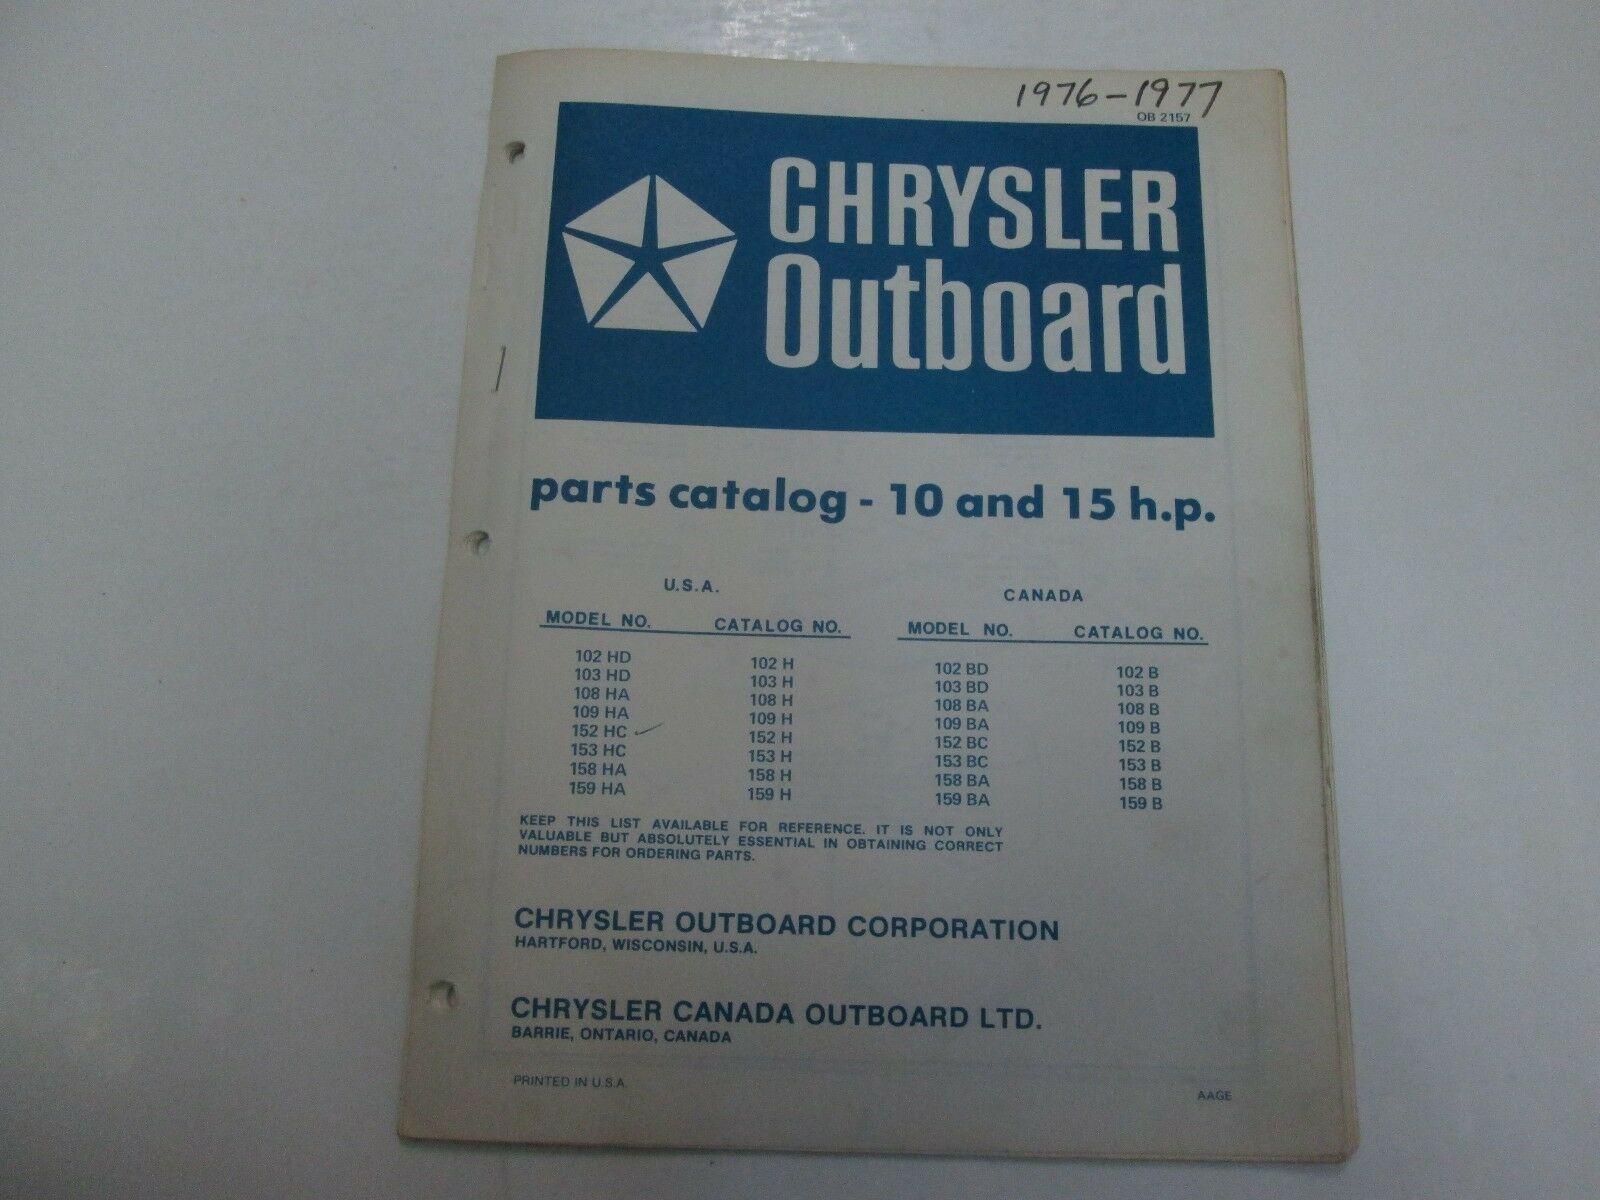 1976 77 Chrysler Outboard 10-15 H.P 102 159 HD HA FORTEMENT RECOMMANDÉ BD BA BC